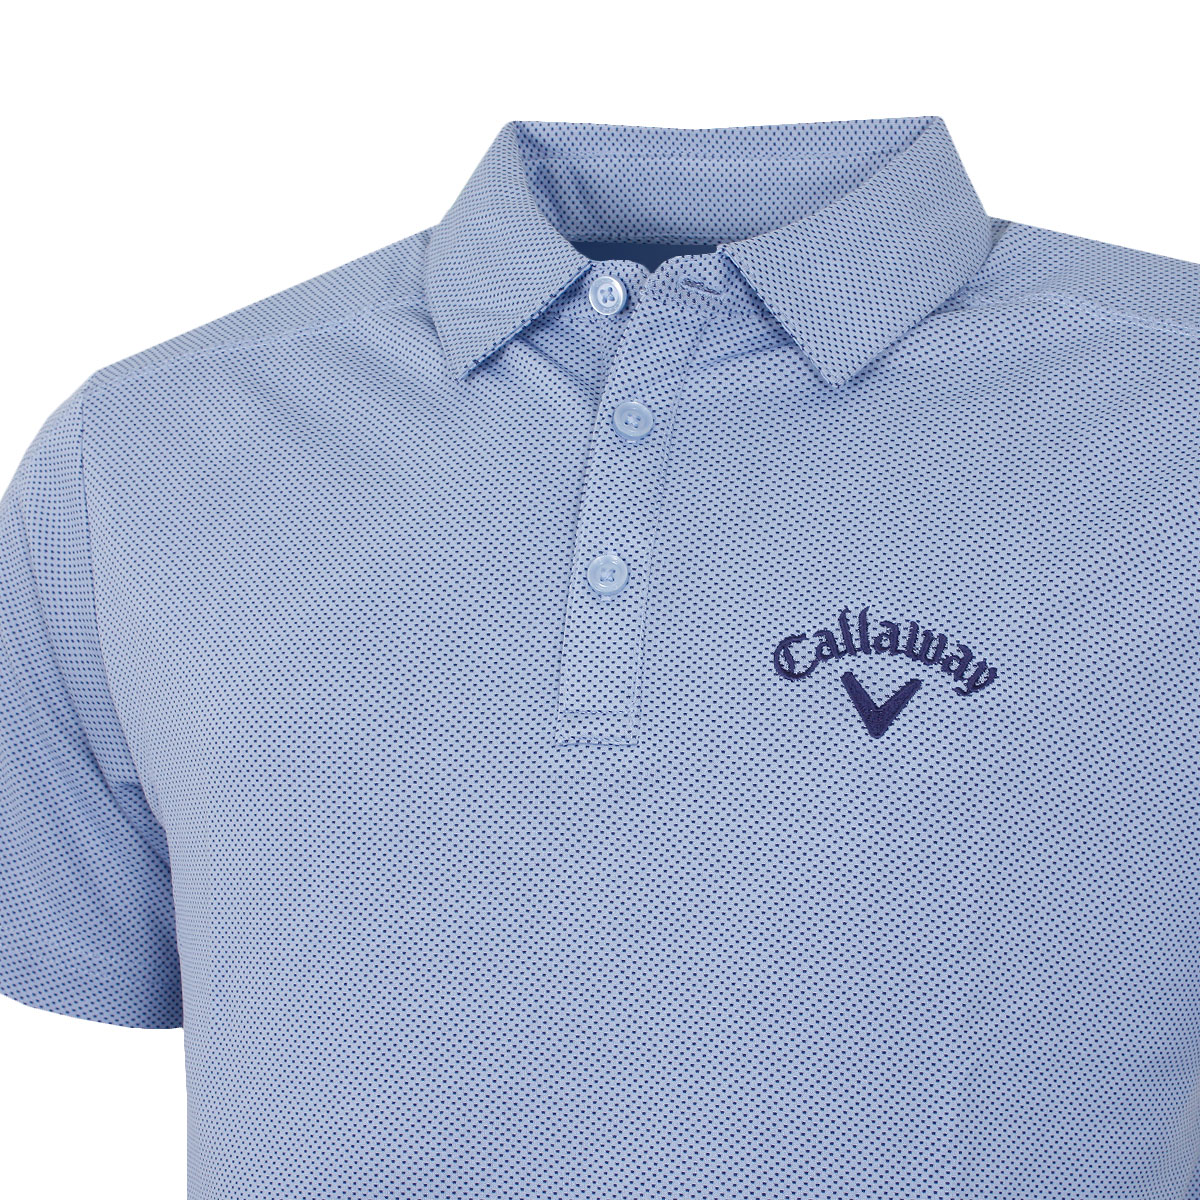 Callaway-Mens-New-Box-Jacquard-Tour-Opti-Dri-Golf-Polo-Shirt-45-OFF-RRP thumbnail 4